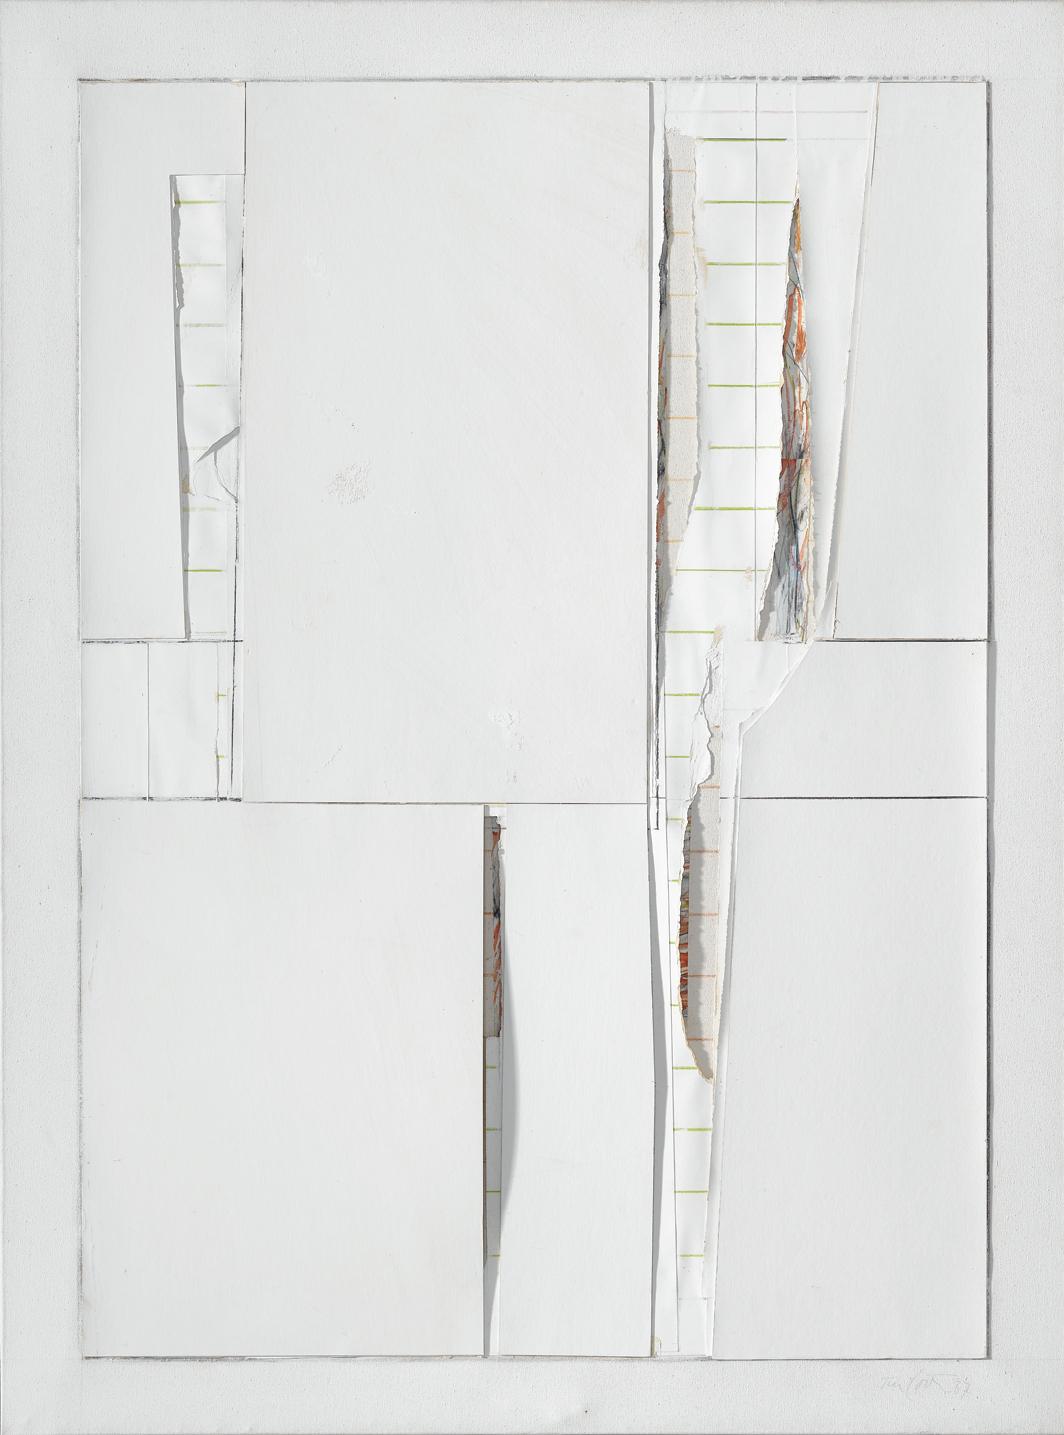 Rafael Tur Costa, untitled, 1987, graphite, colored pencil, and paper on canvas, 51 1⁄8 × 38 1⁄4